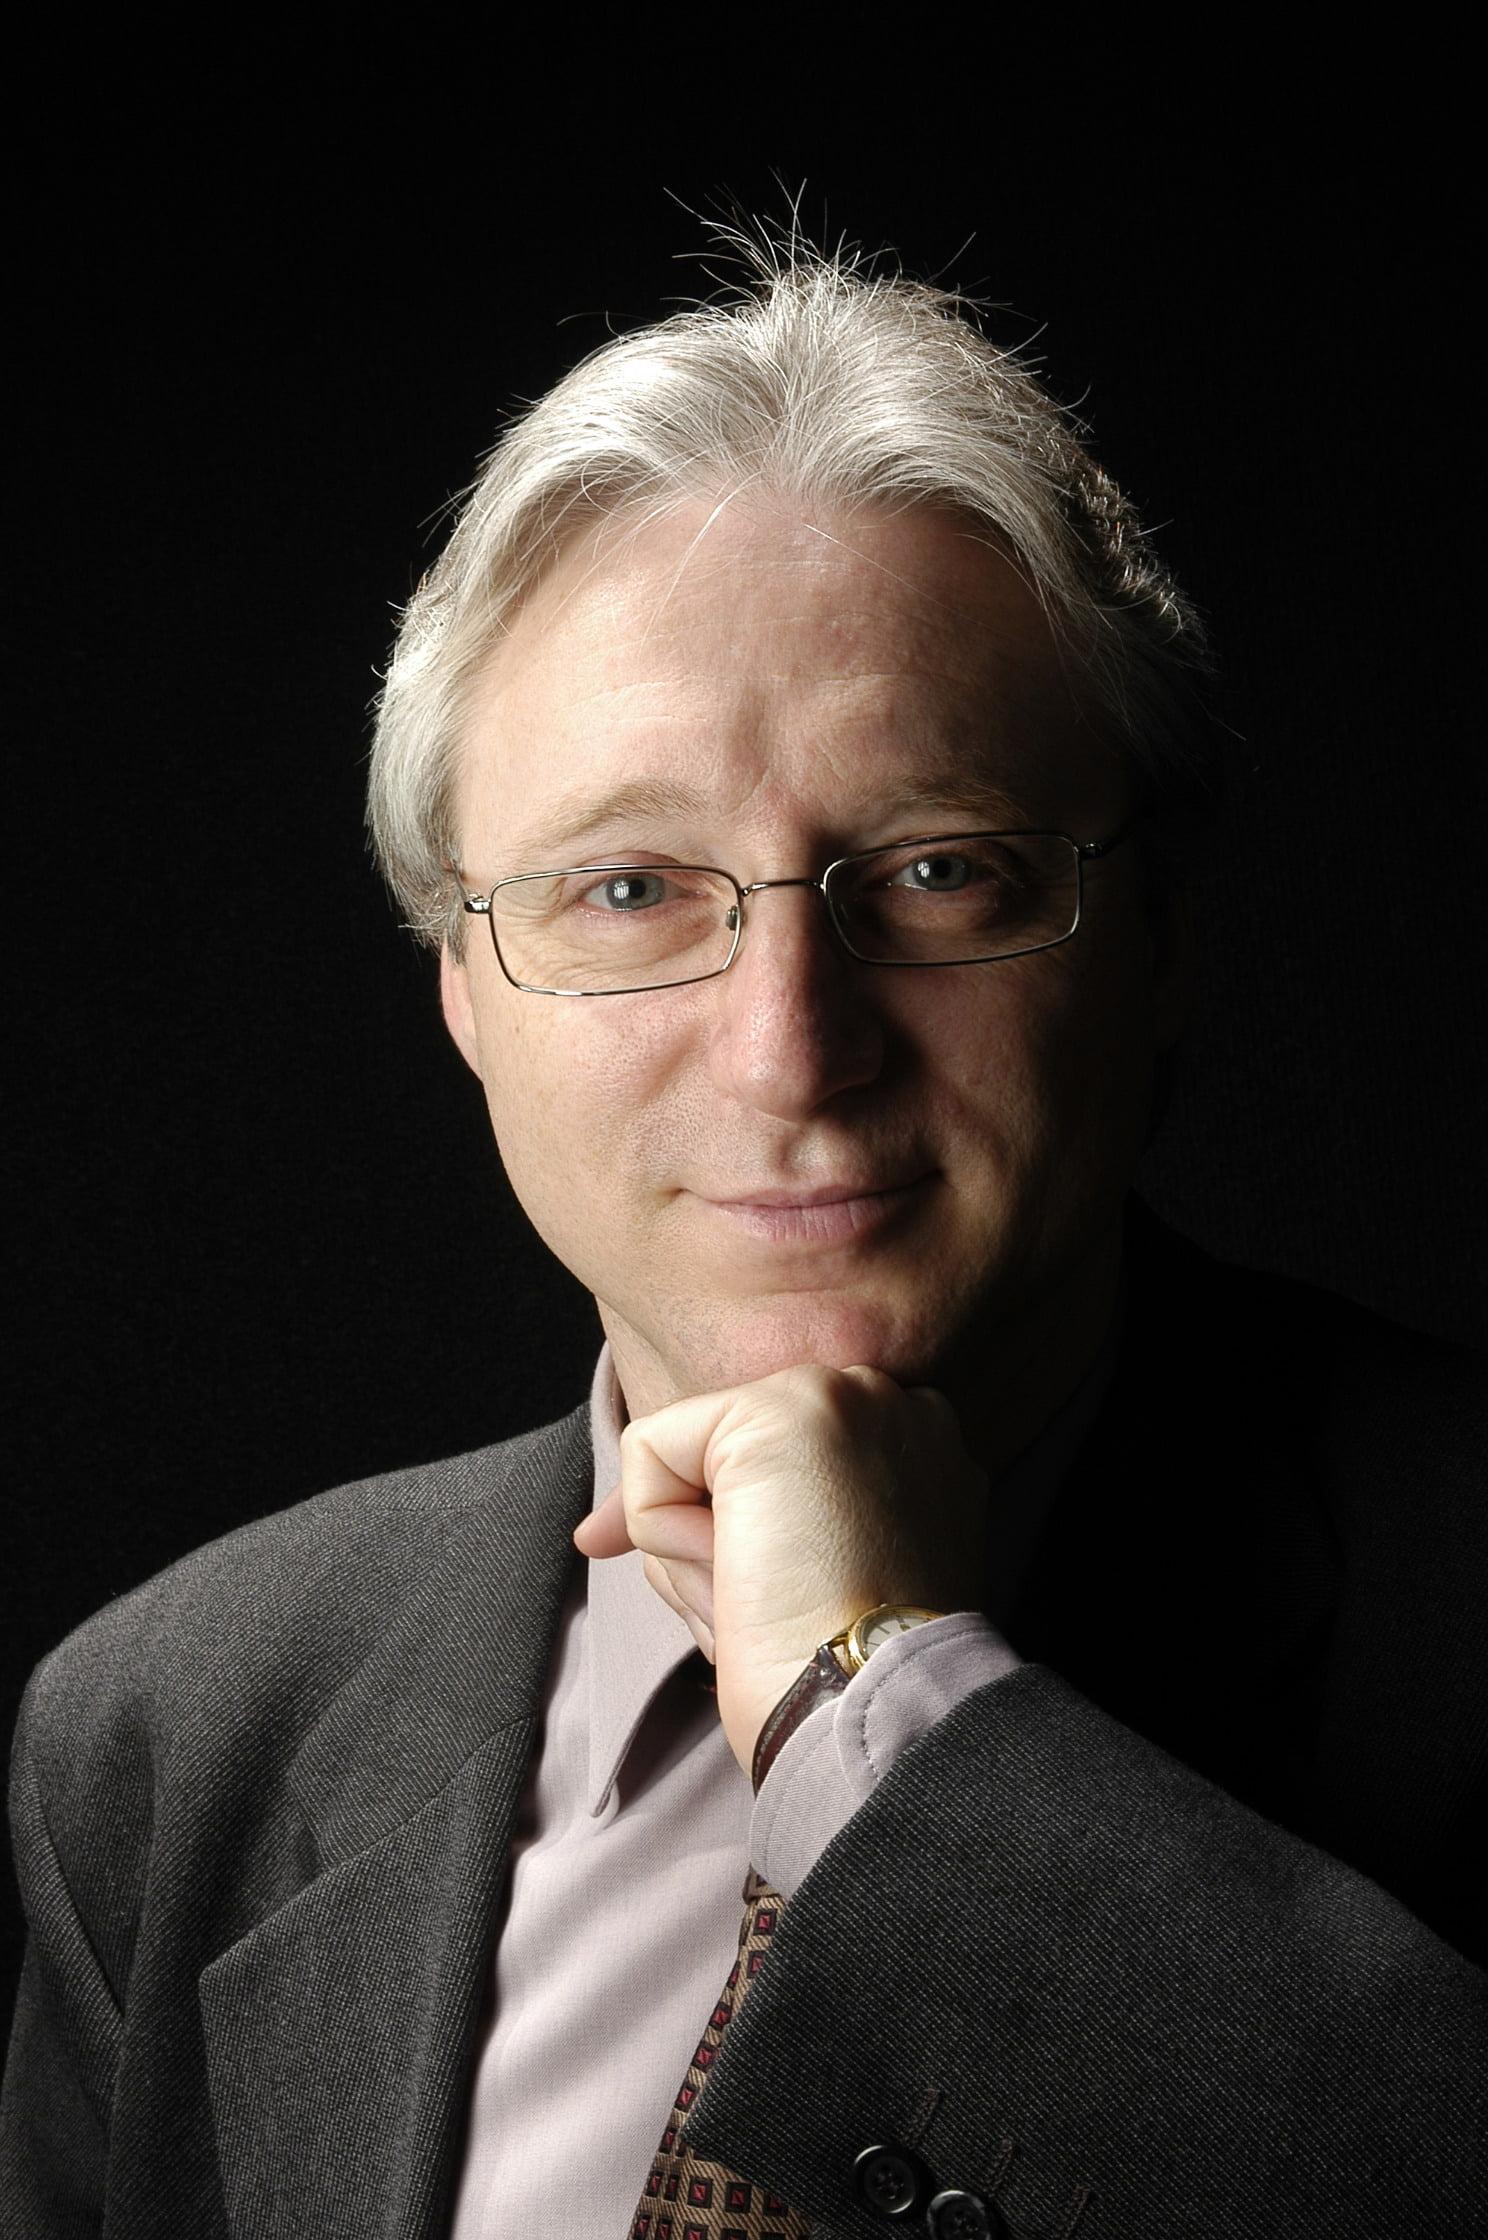 Dr. Josep Castells Boliart